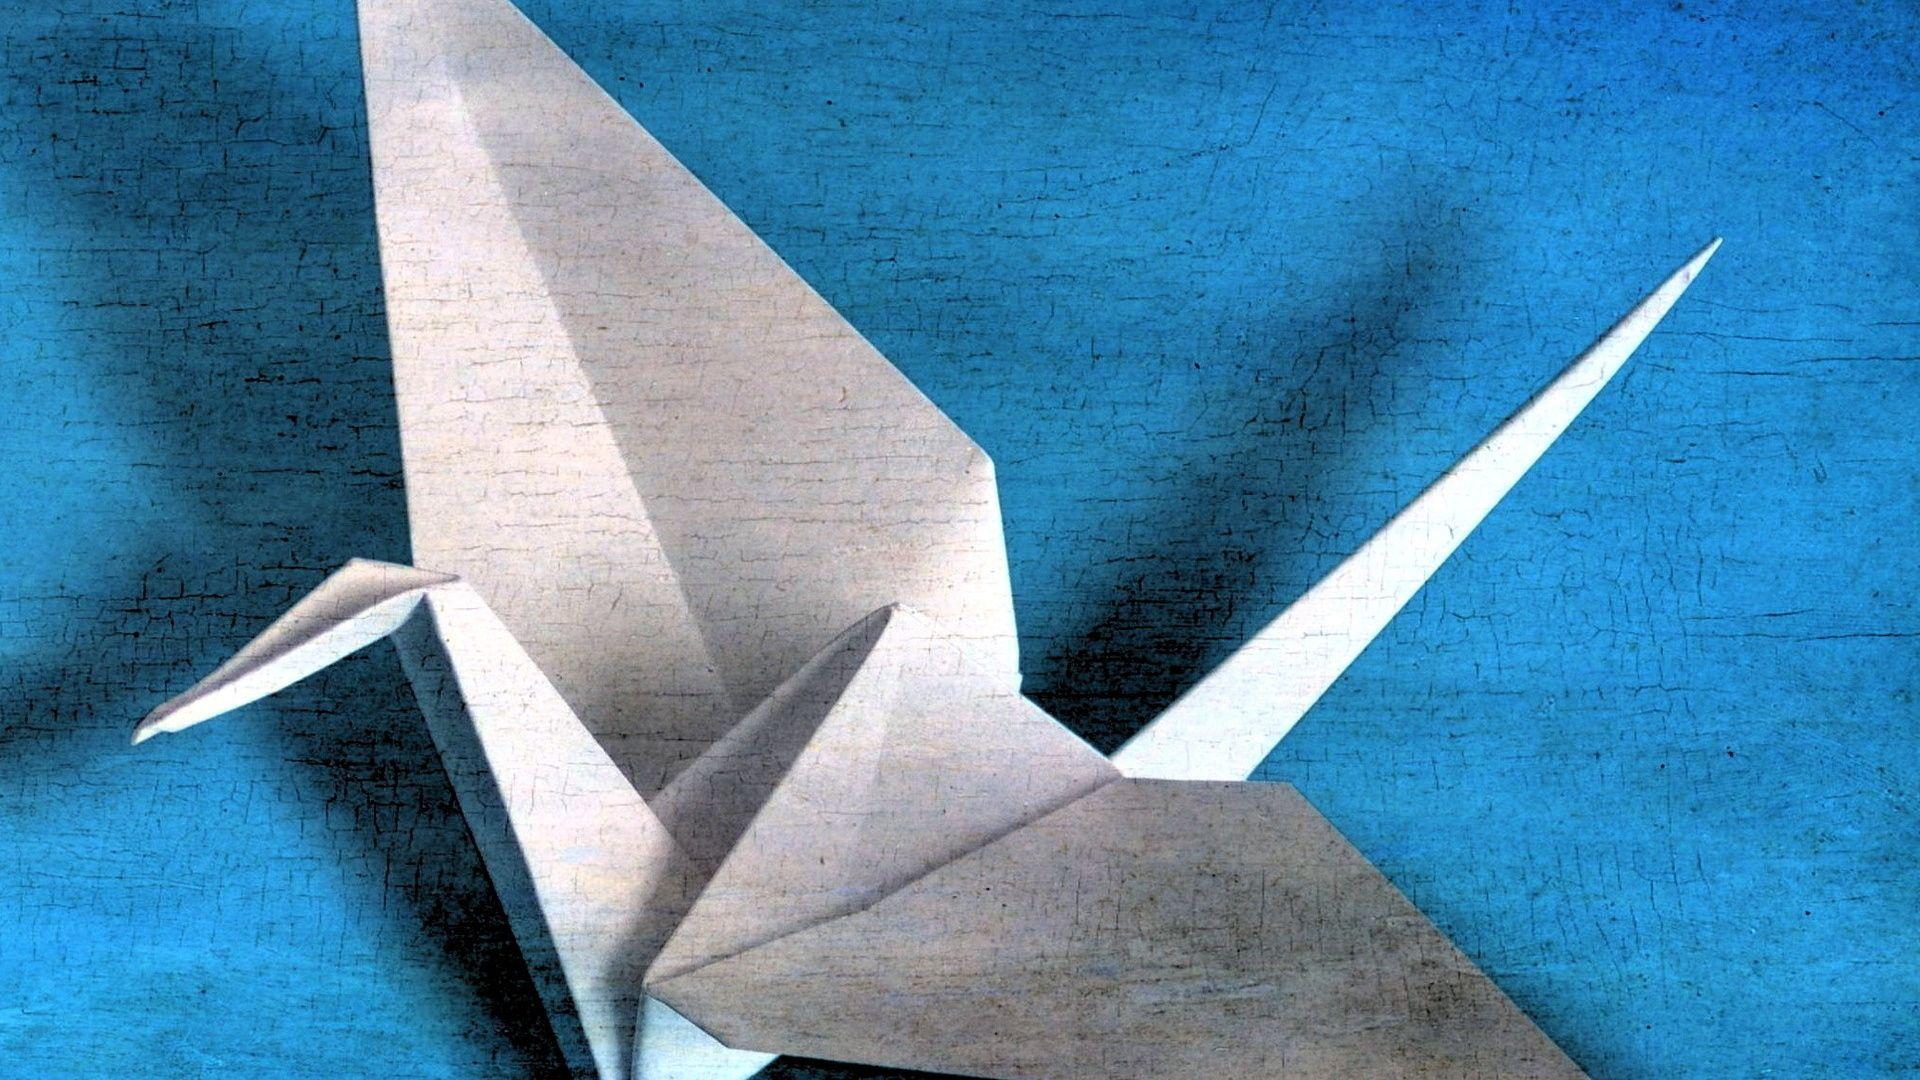 Origami hd